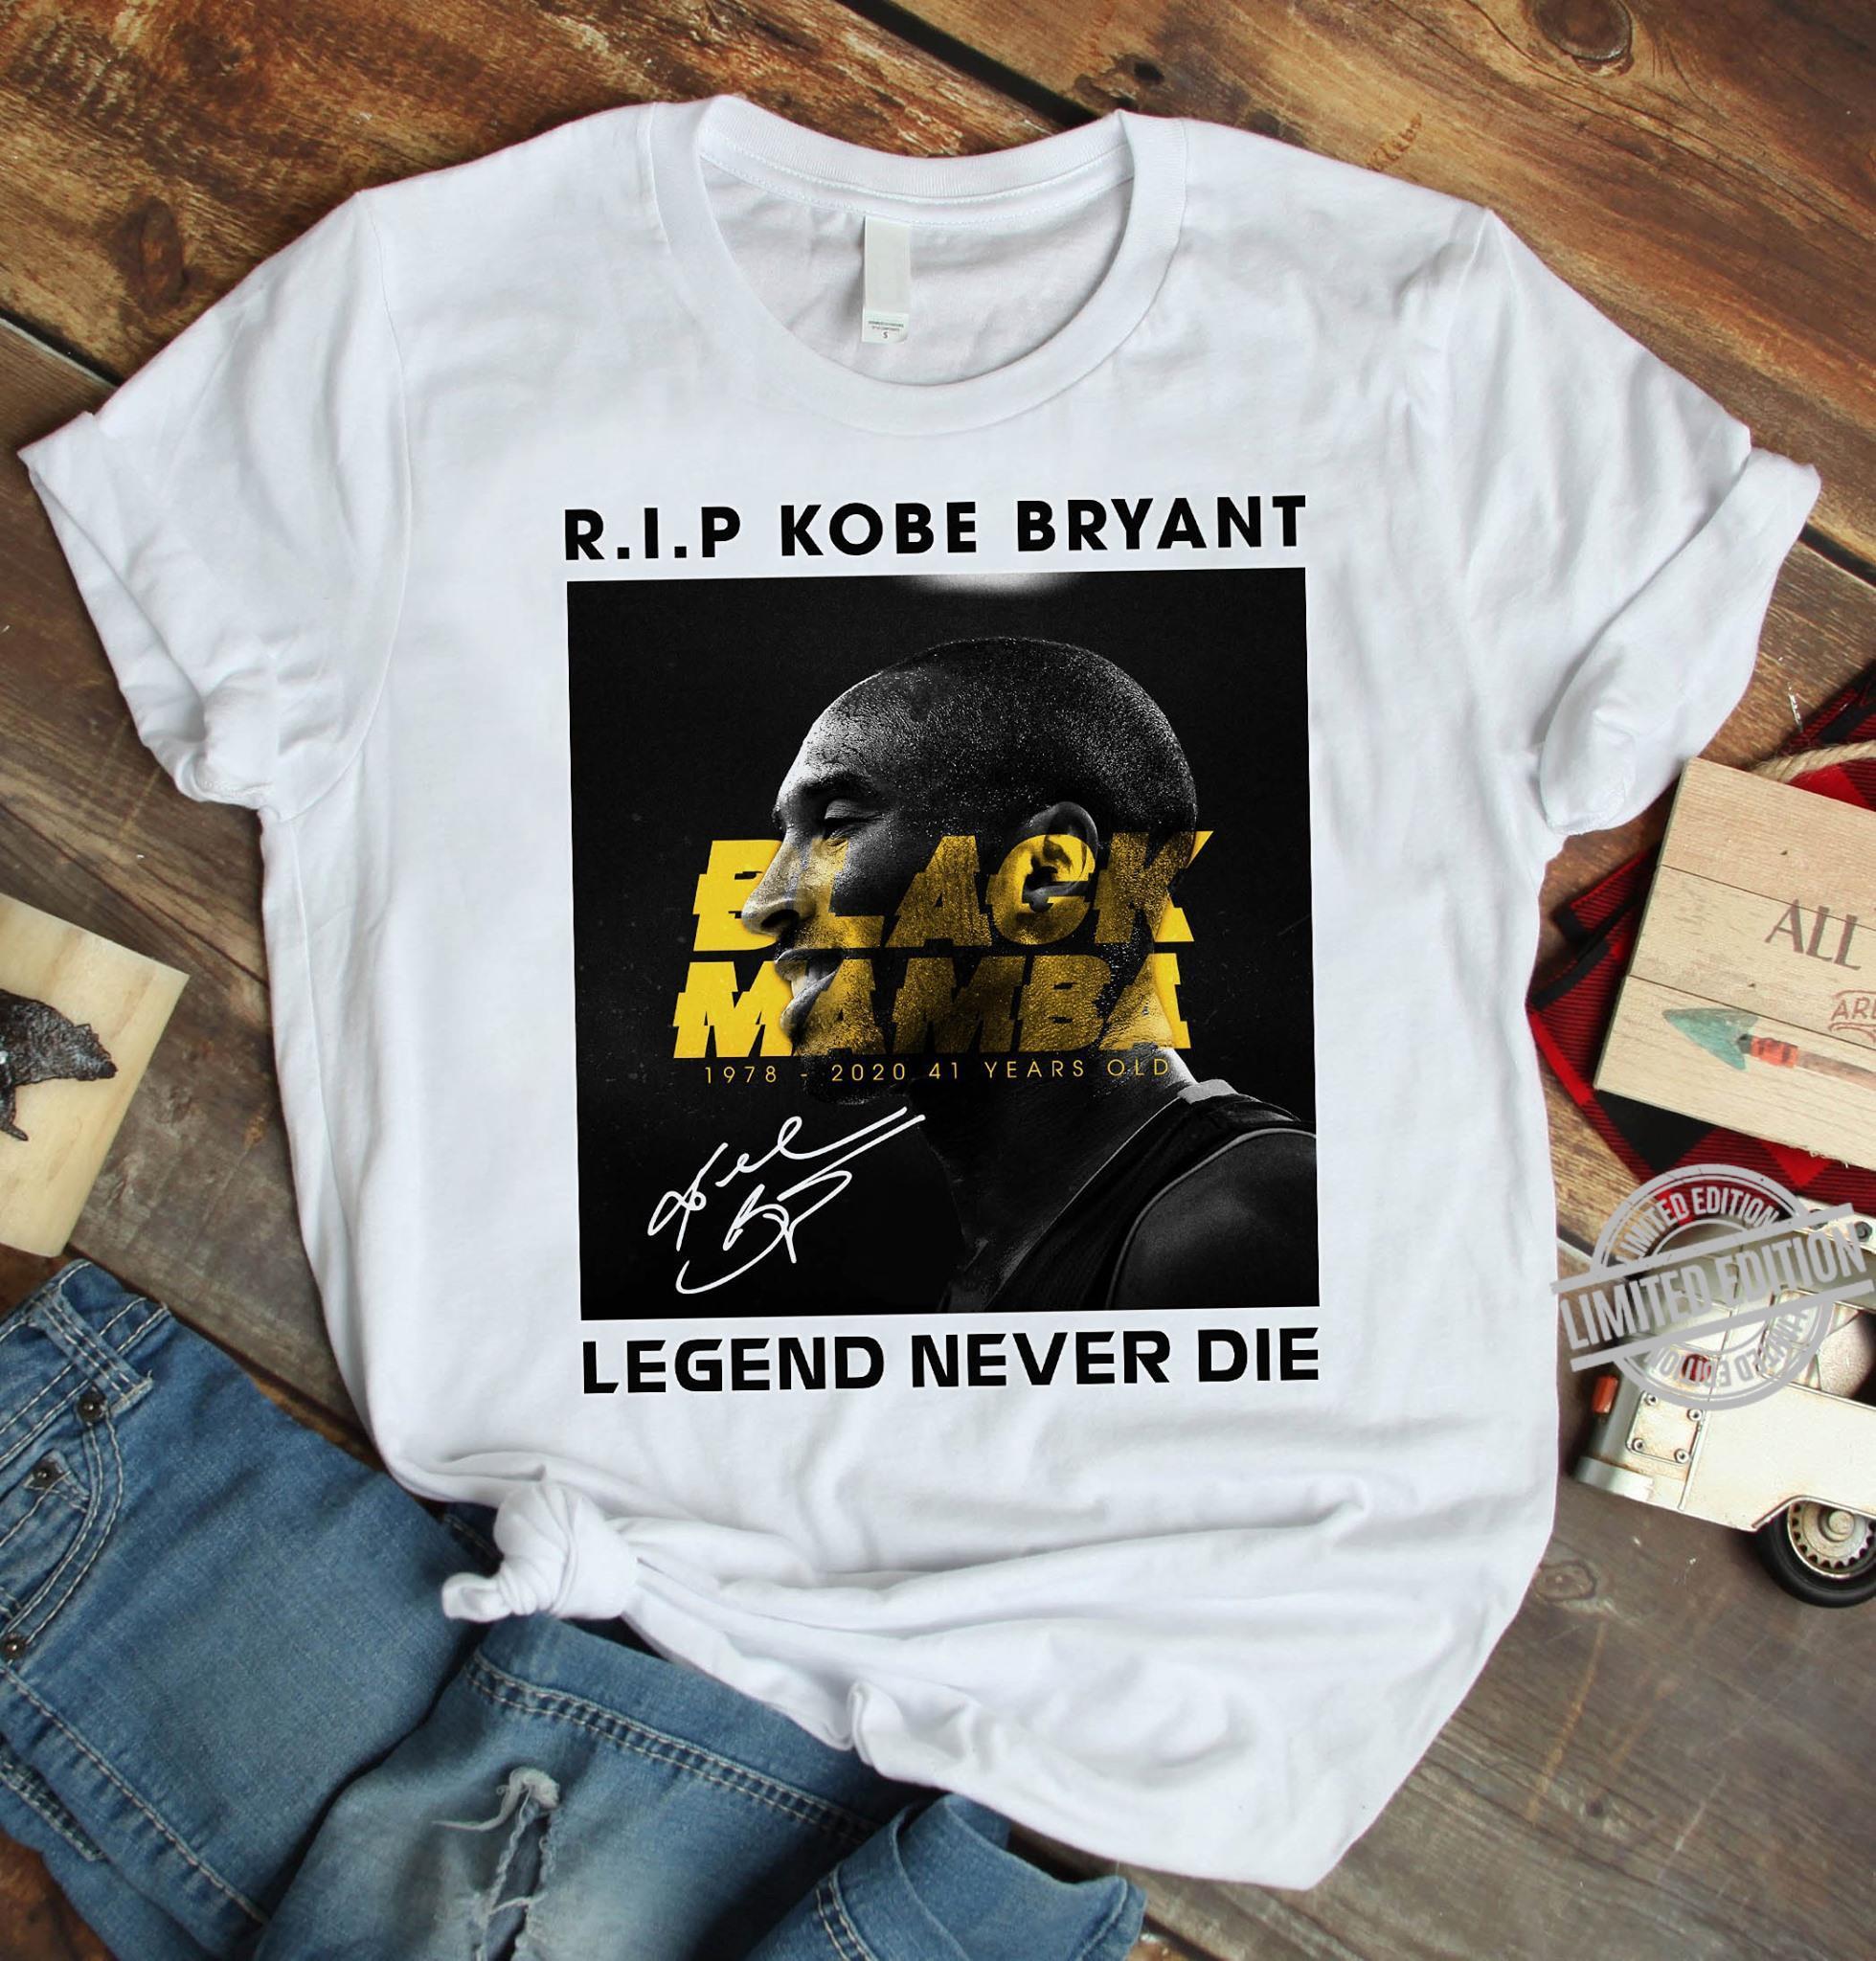 Rip kobe bryant legend never die shirt